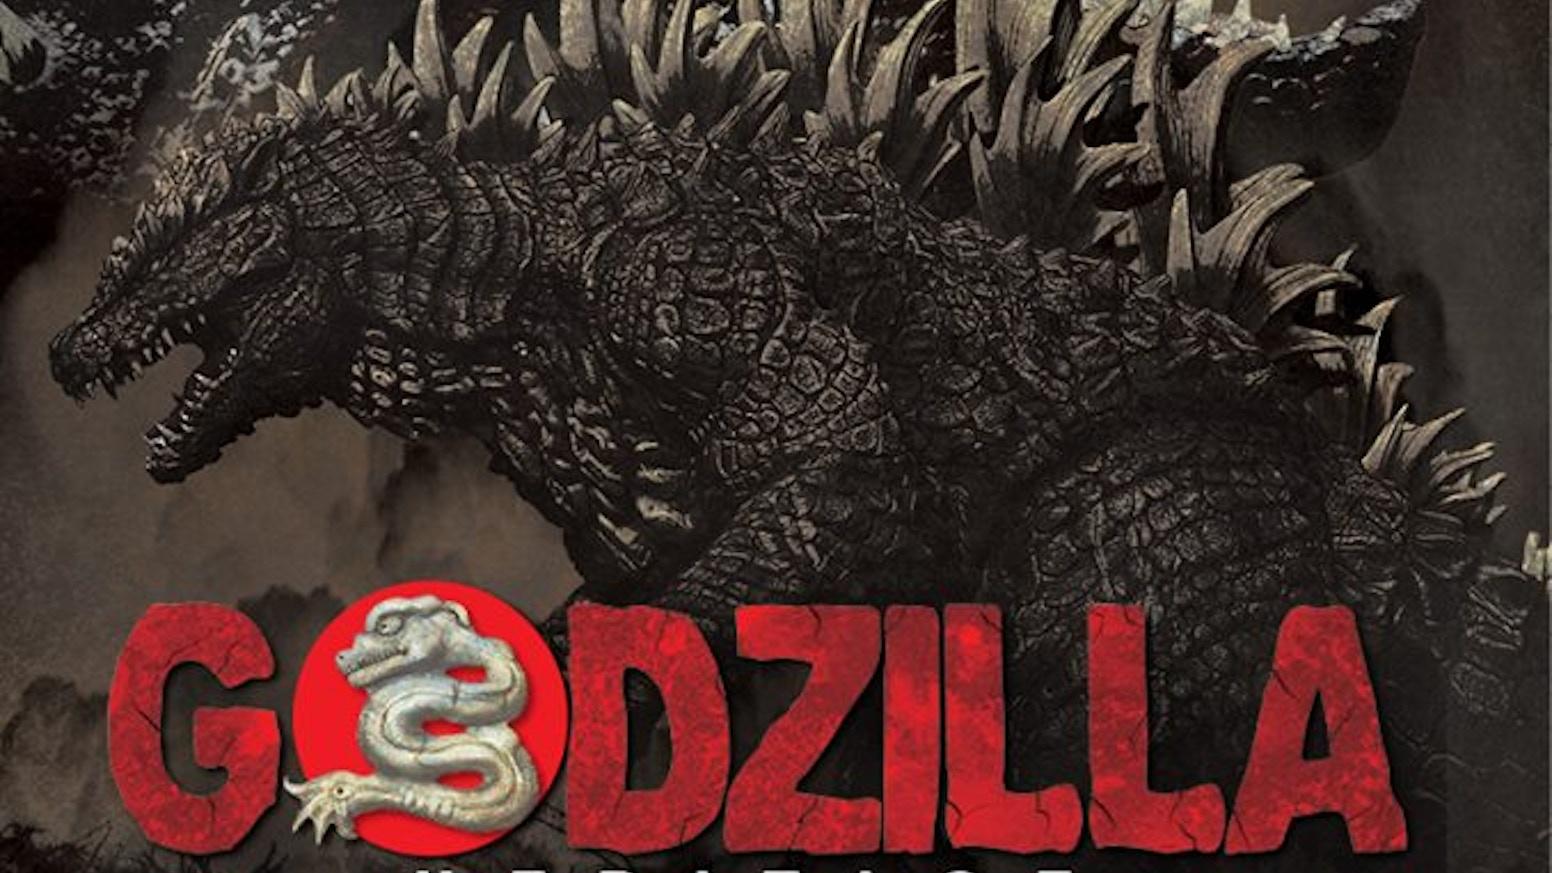 Fundraiser 1 of 2 for the non-profit Godzilla fan film, Godzilla: Heritage.